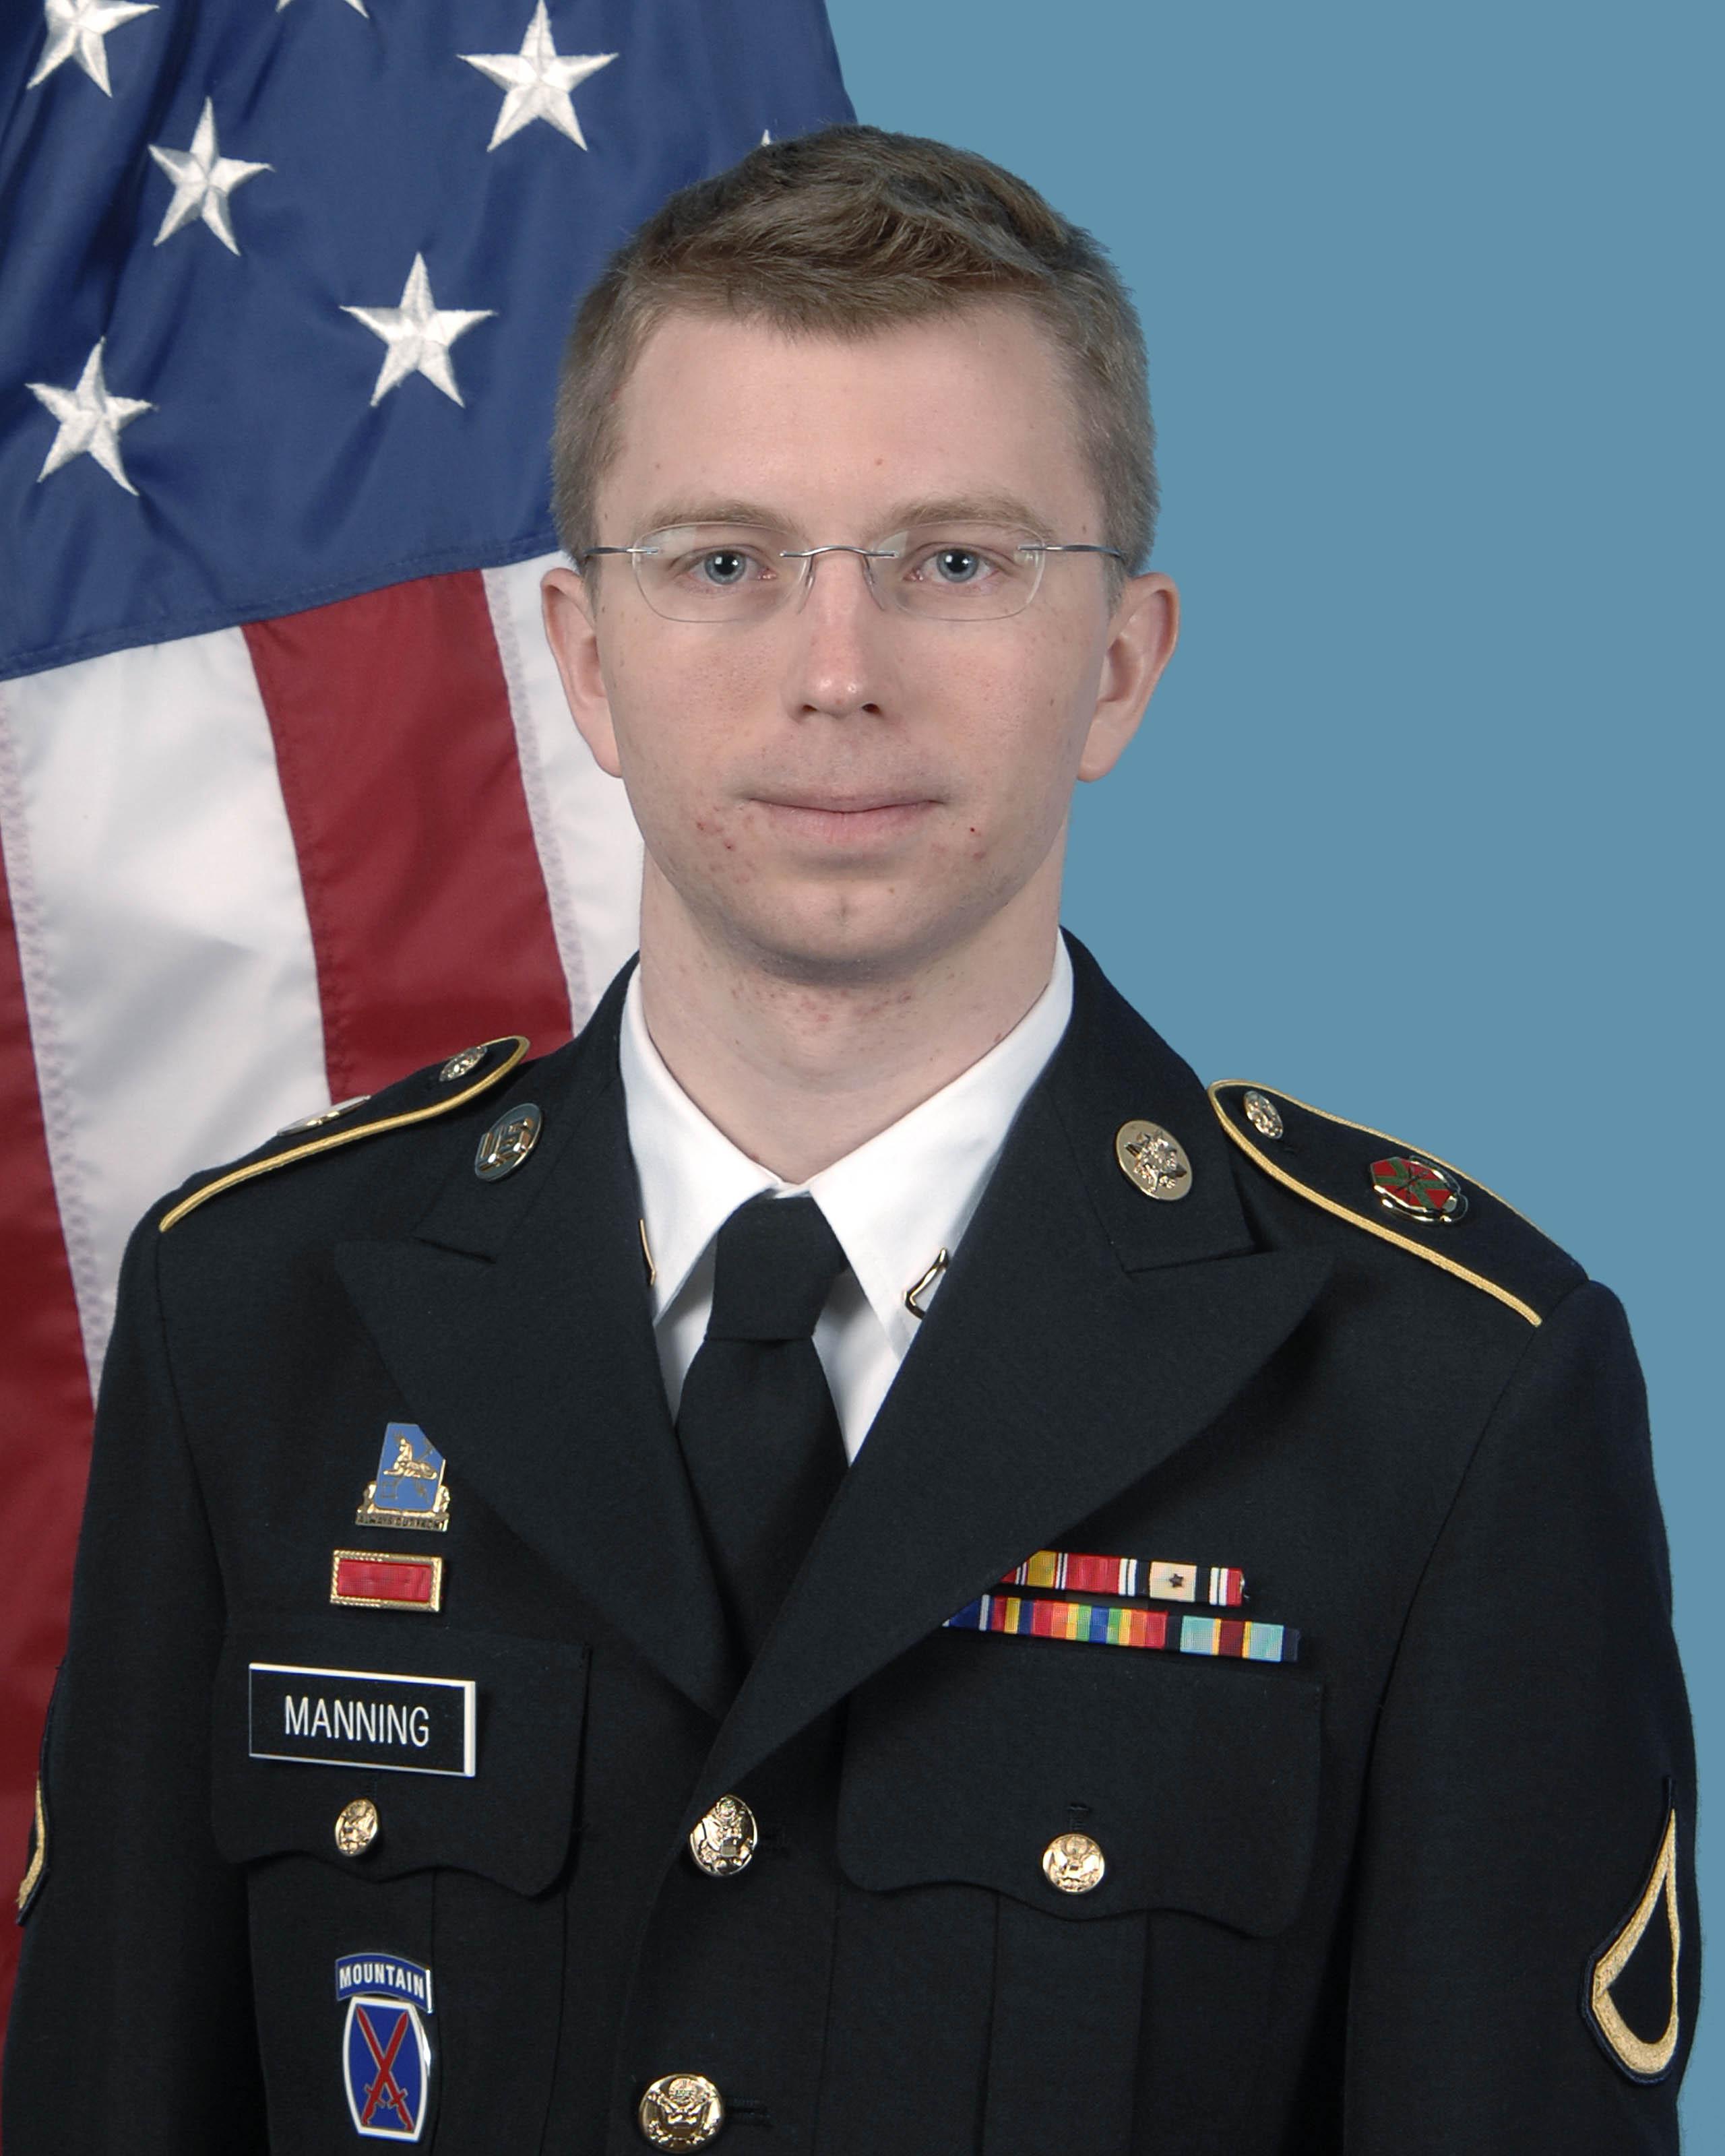 2013-08-22-Bradley_Manning_US_Army.jpg